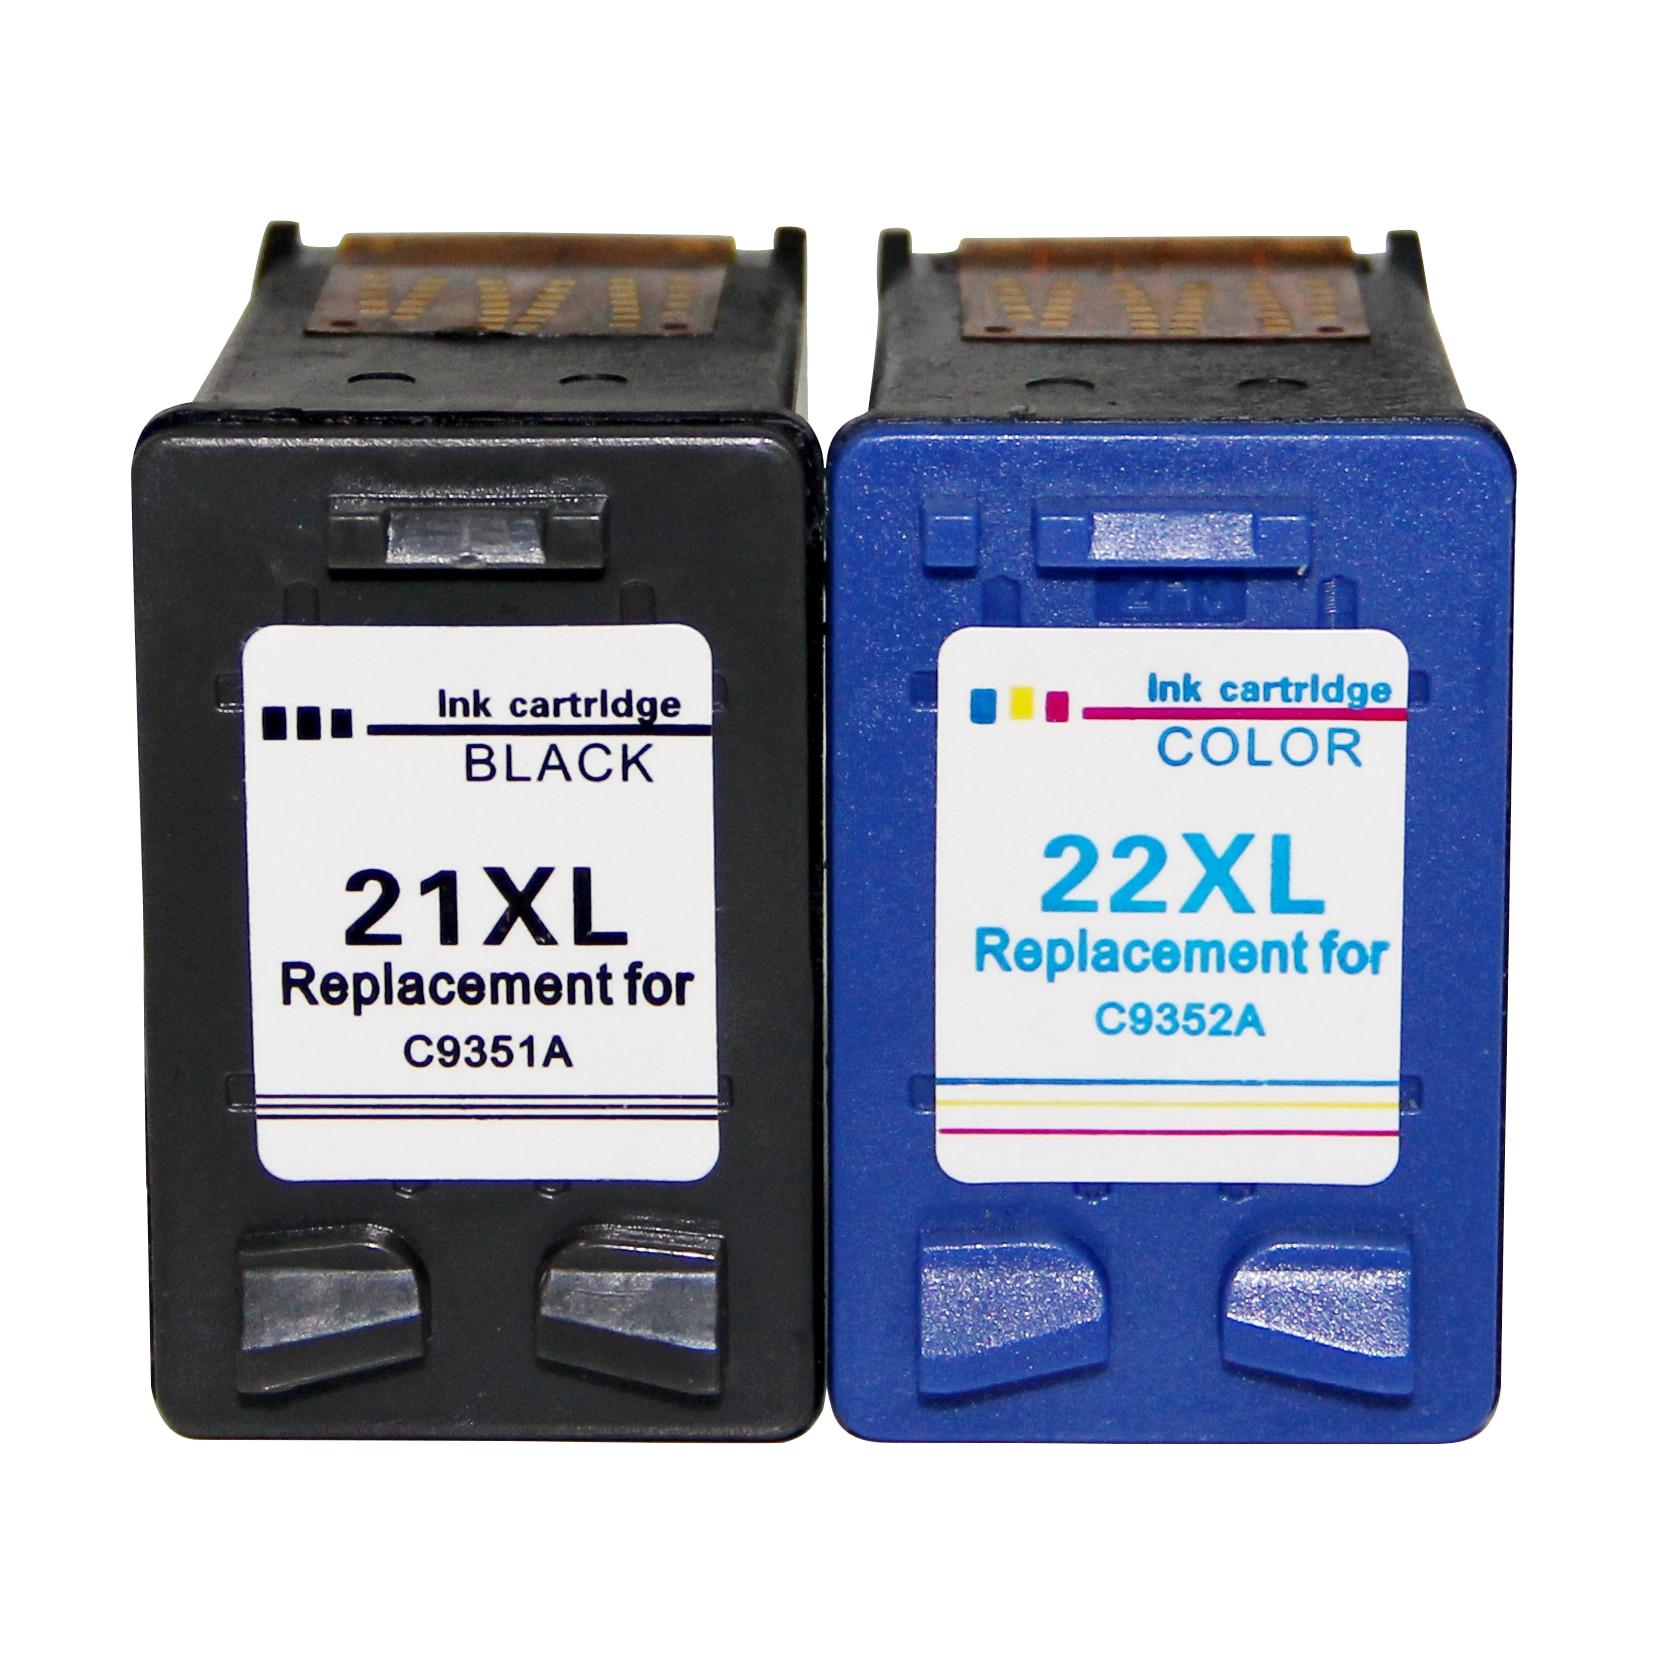 Remanufactured For HP 21 HP 22 XLCartuchos Ink For HP Deskjet F4180 F2280 F2180 F370, HP PSC 1410 Officejet 4315 4355